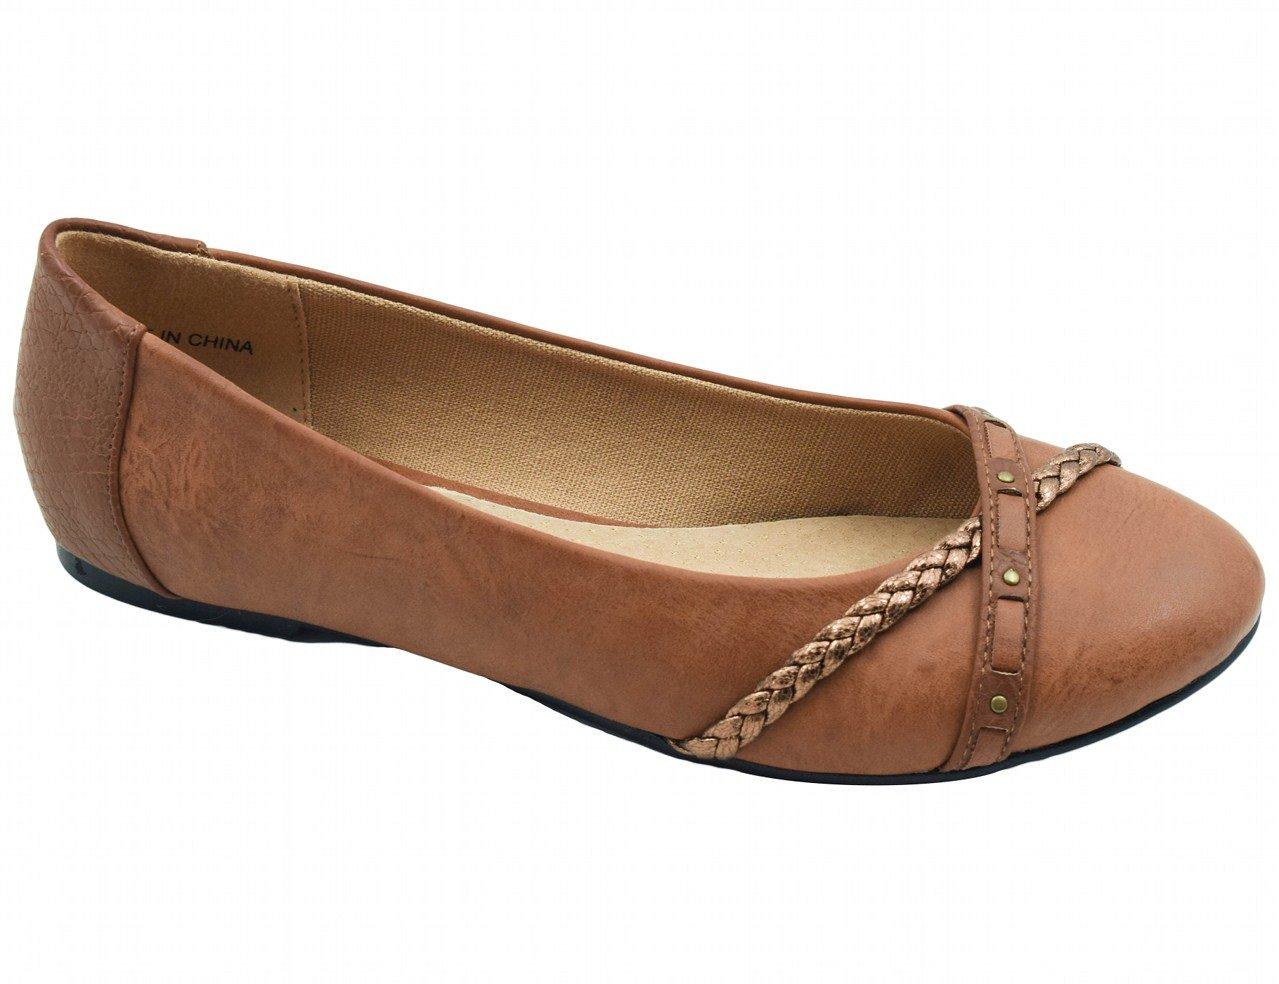 Greatonu Camel Slip-on Comfort Walking Ballet Ballerina Flats Size 7